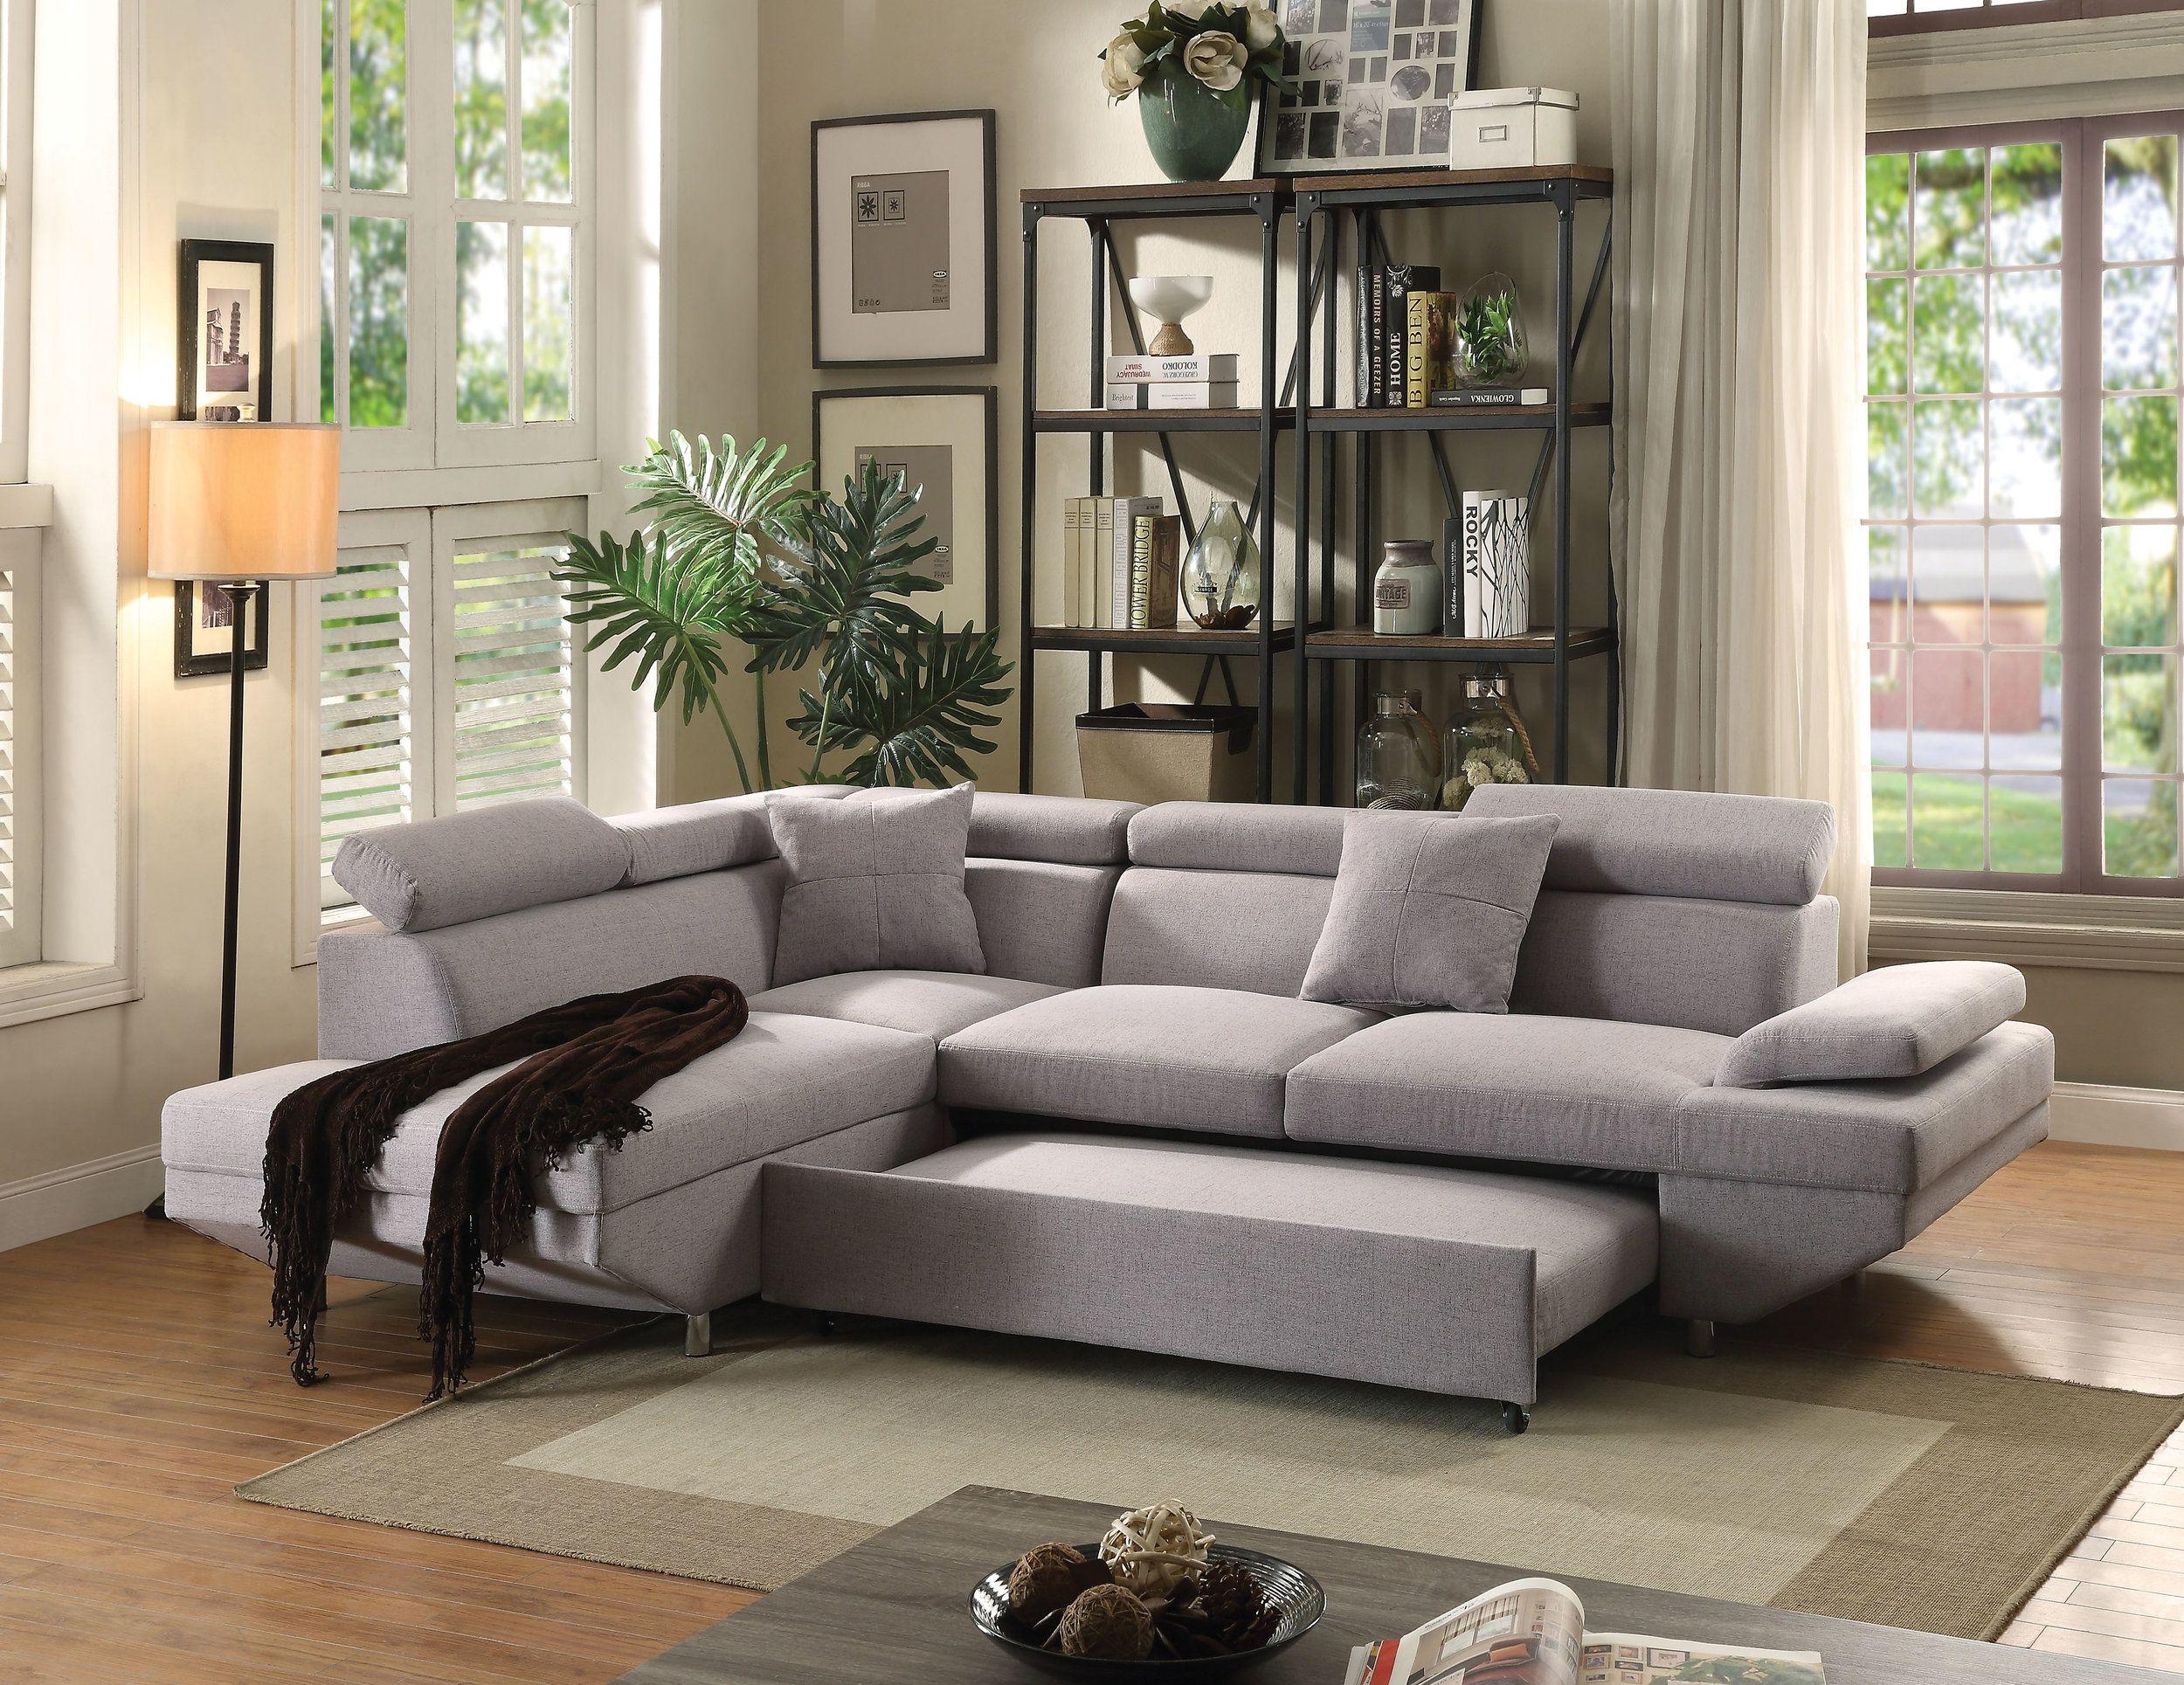 Sectional Sofa W Sleeper Decodesign Furniture Furniture Store Miami Fl Wholesale Prices Sectional Sleeper Sofa Sectional Sofa Grey Sectional Sofa